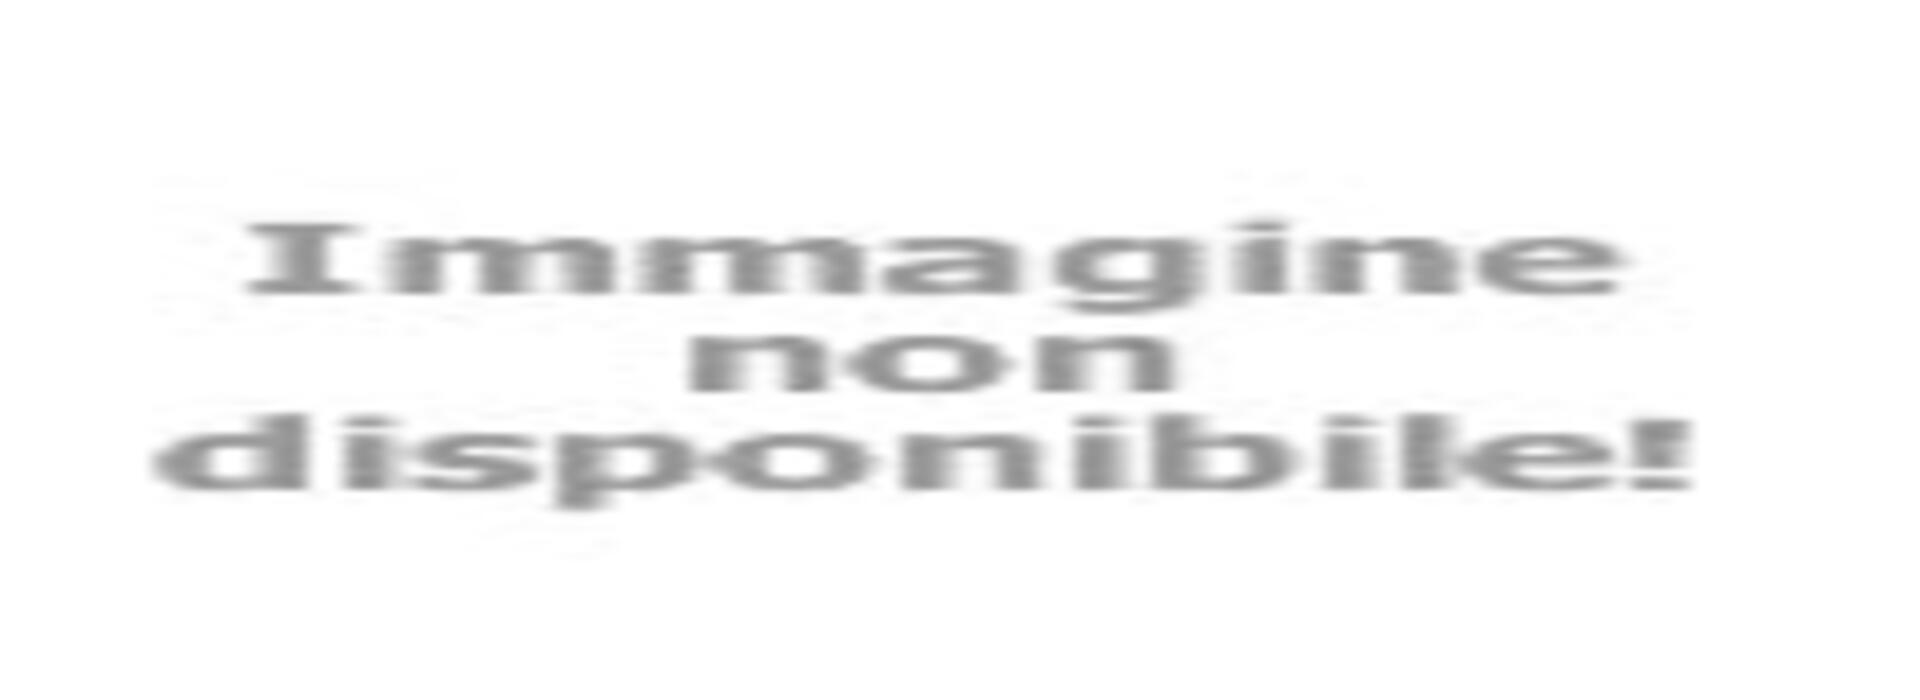 hotel-montecarlo hu fejlodes 019